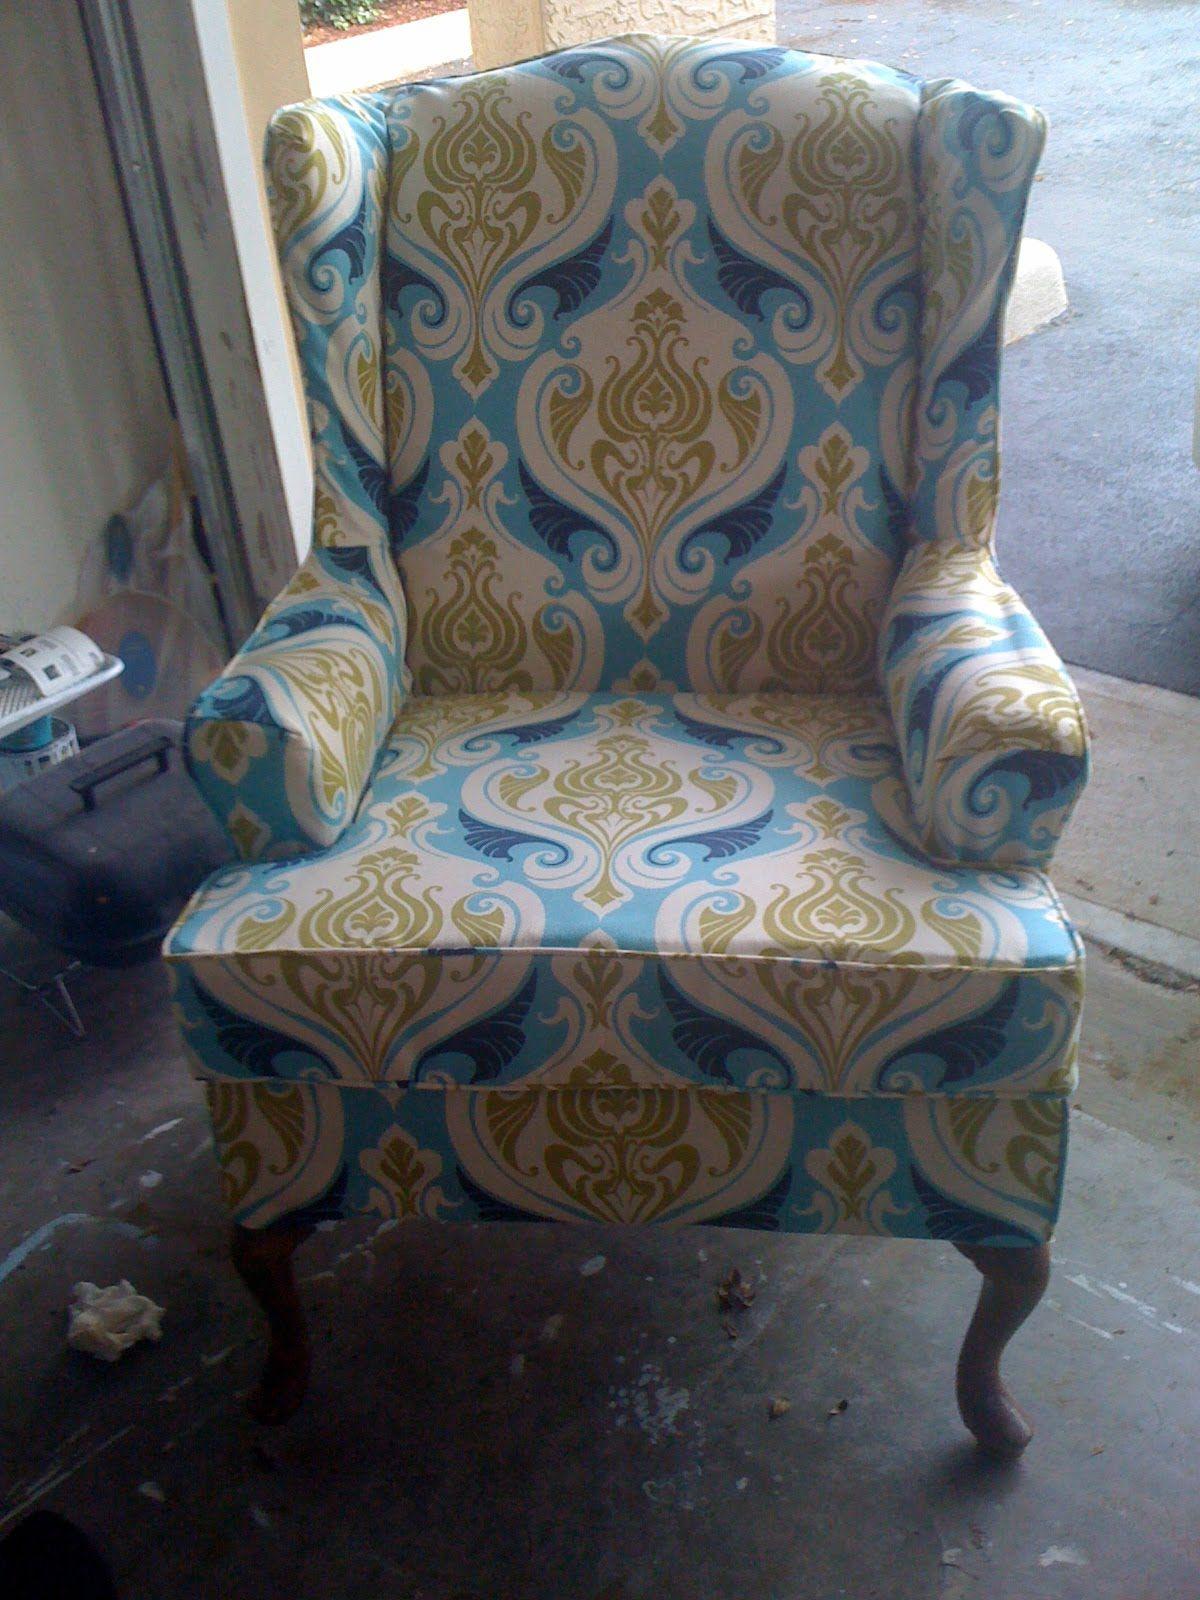 Wingback Chair Slipcover Decor Ideas: Wingback Chair Slipcover   How To Make  Slipcovers For Wingback